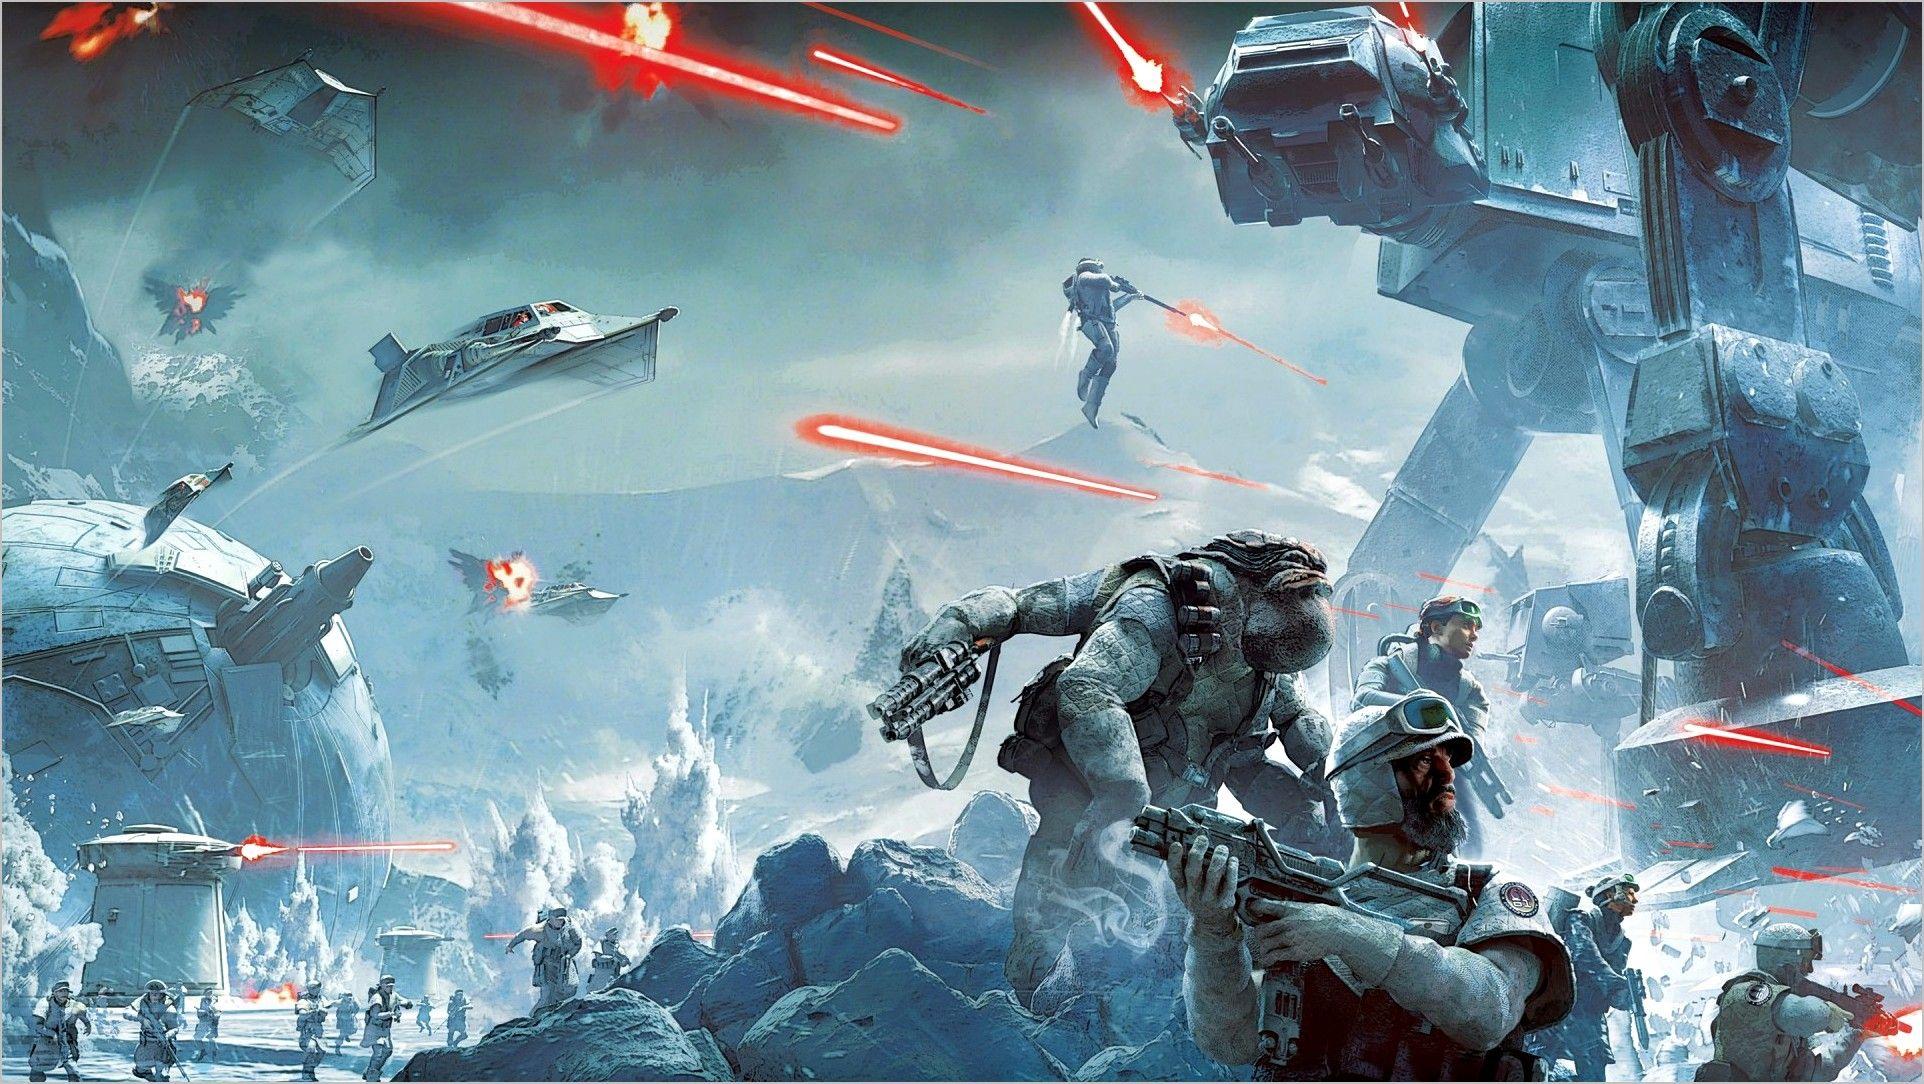 Pc Wallpaper 4k 1920 215 1080 Star Wars In 2020 Star Wars Wallpaper Star Wars Battlefront Star Wars Galaxies